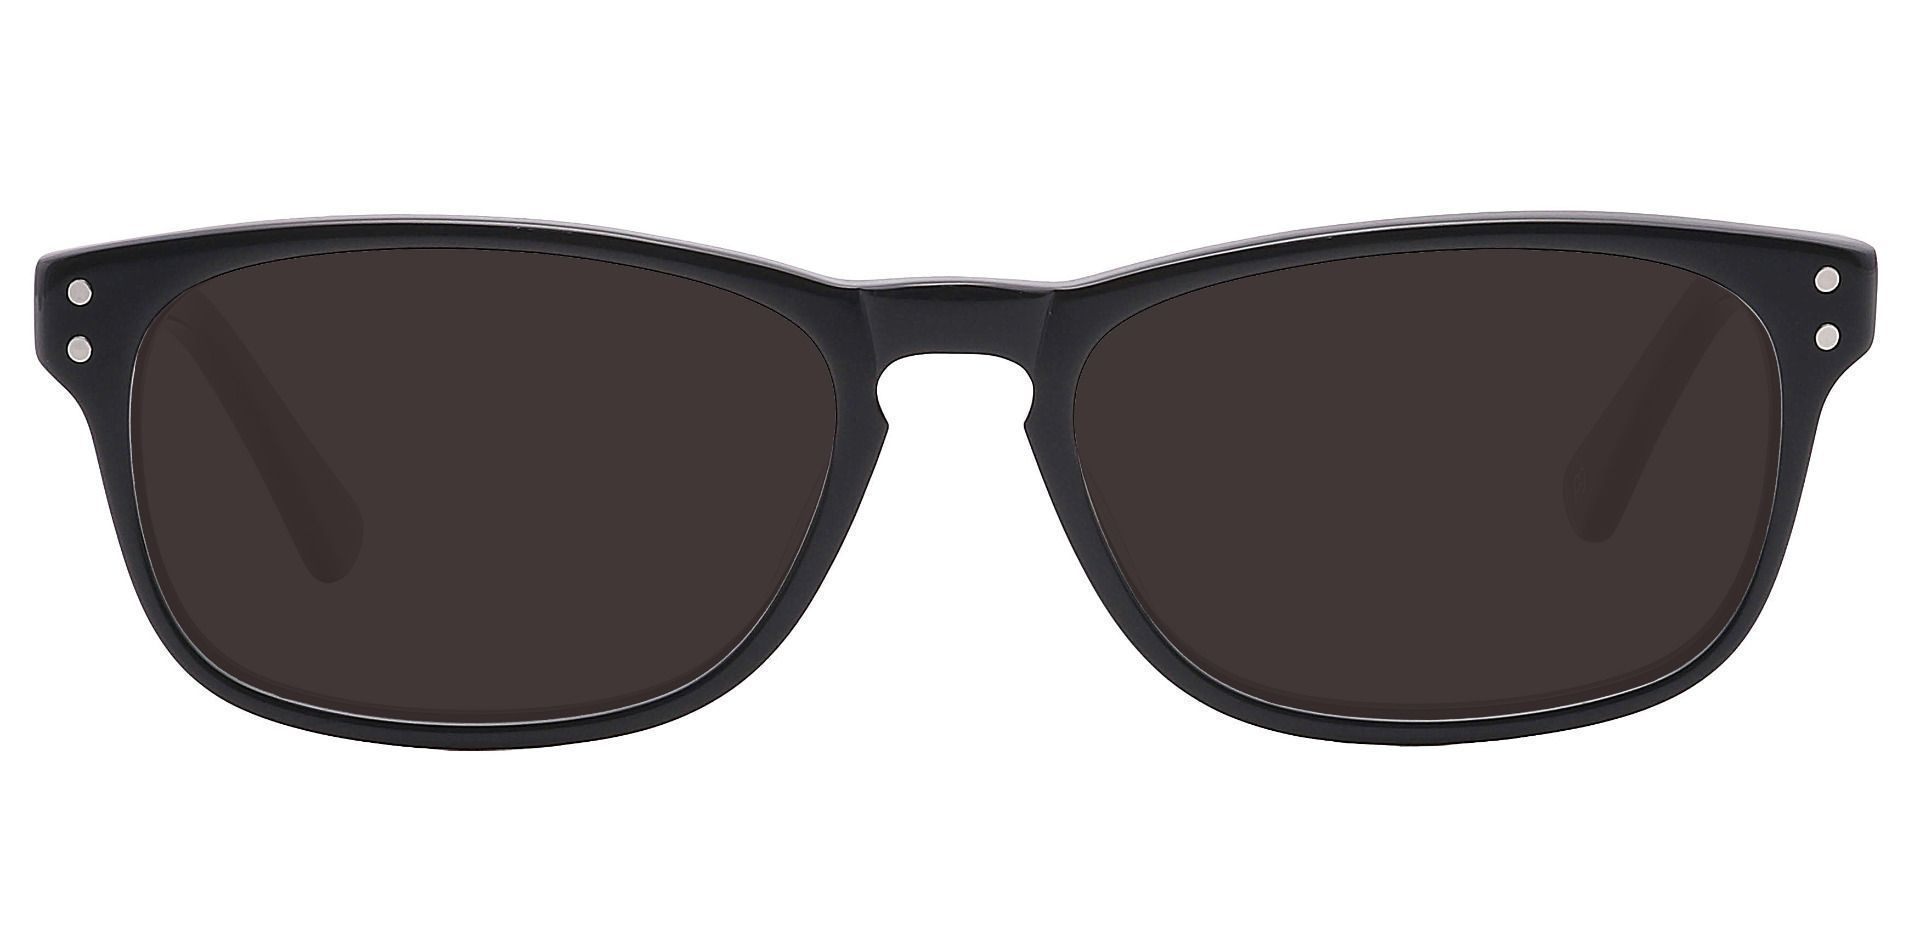 Morris Rectangle Prescription Sunglasses - Black Frame With Gray Lenses